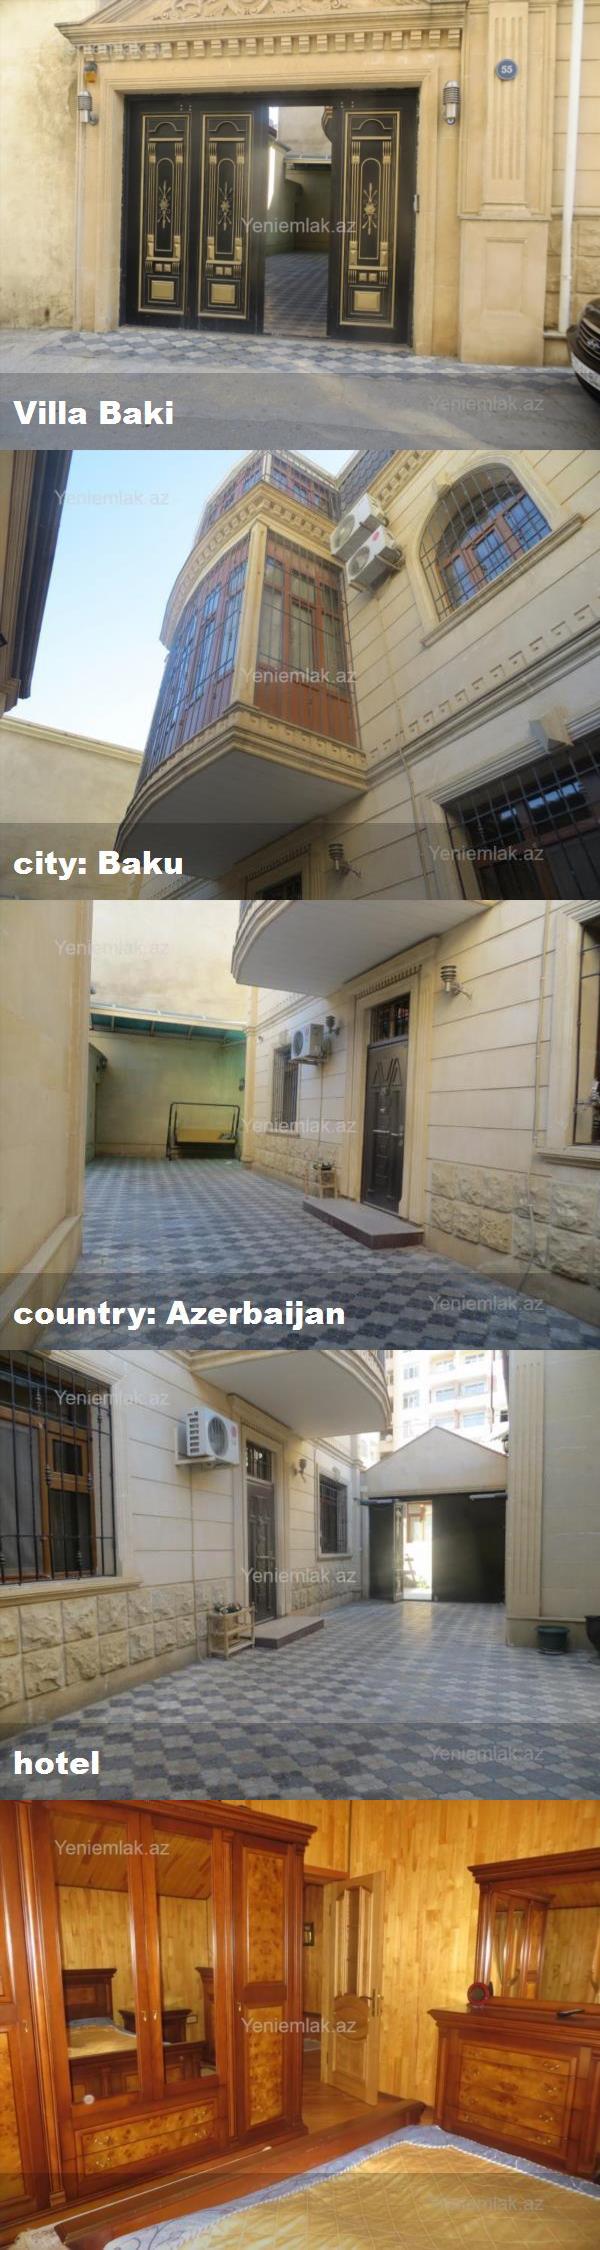 Villa Baki City Baku Country Azerbaijan Hotel Hotel Great Hotel Villa